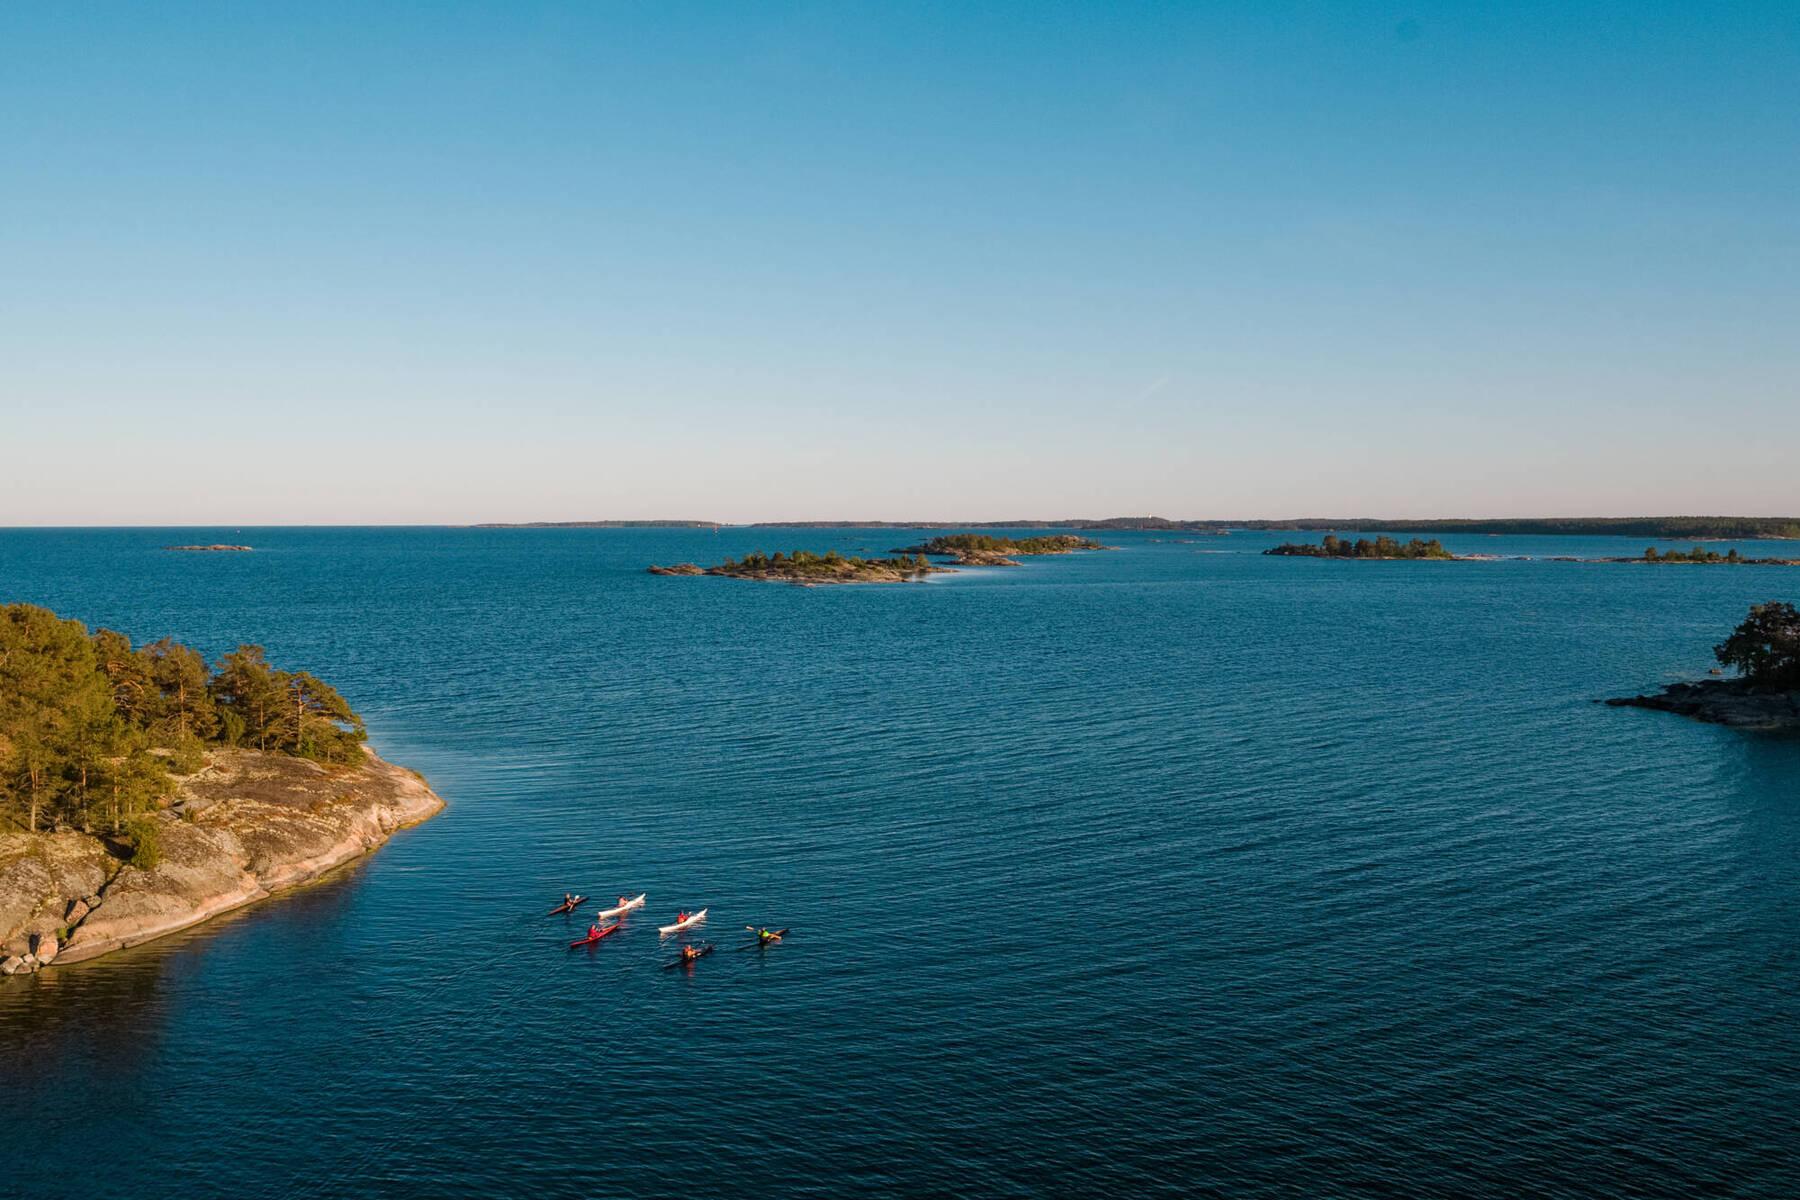 Kayaking in Västervik